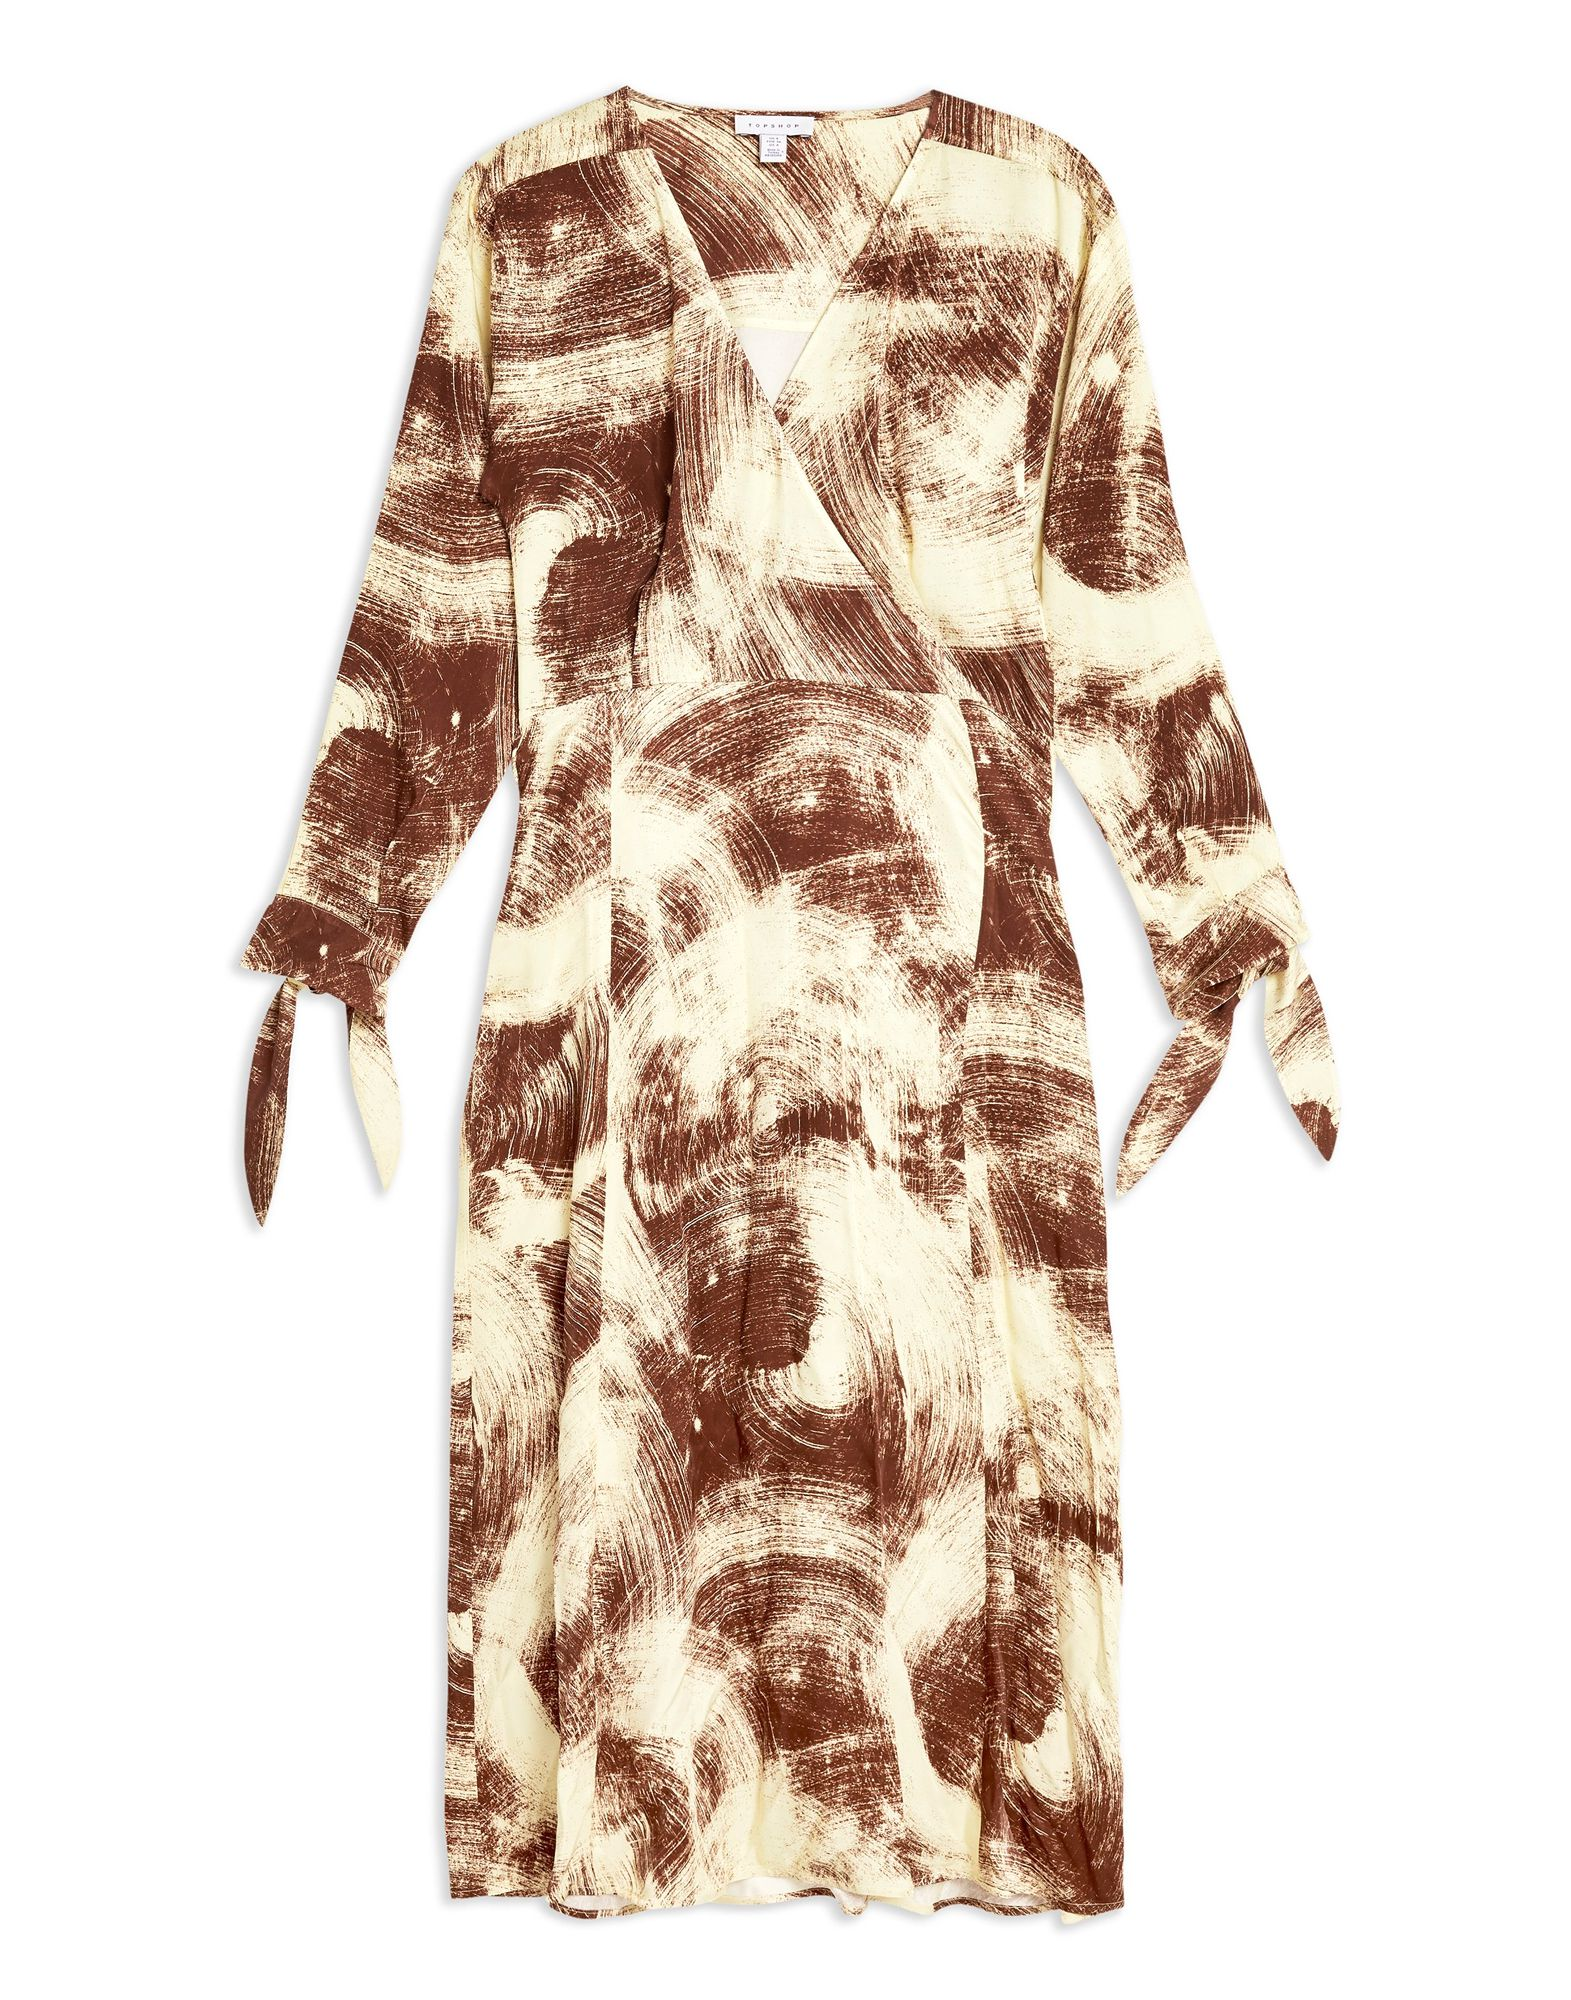 Vestito Longuette Topshop Swirl Wrap Dress Dress Dress By Boutique - donna - 34945224PB f03